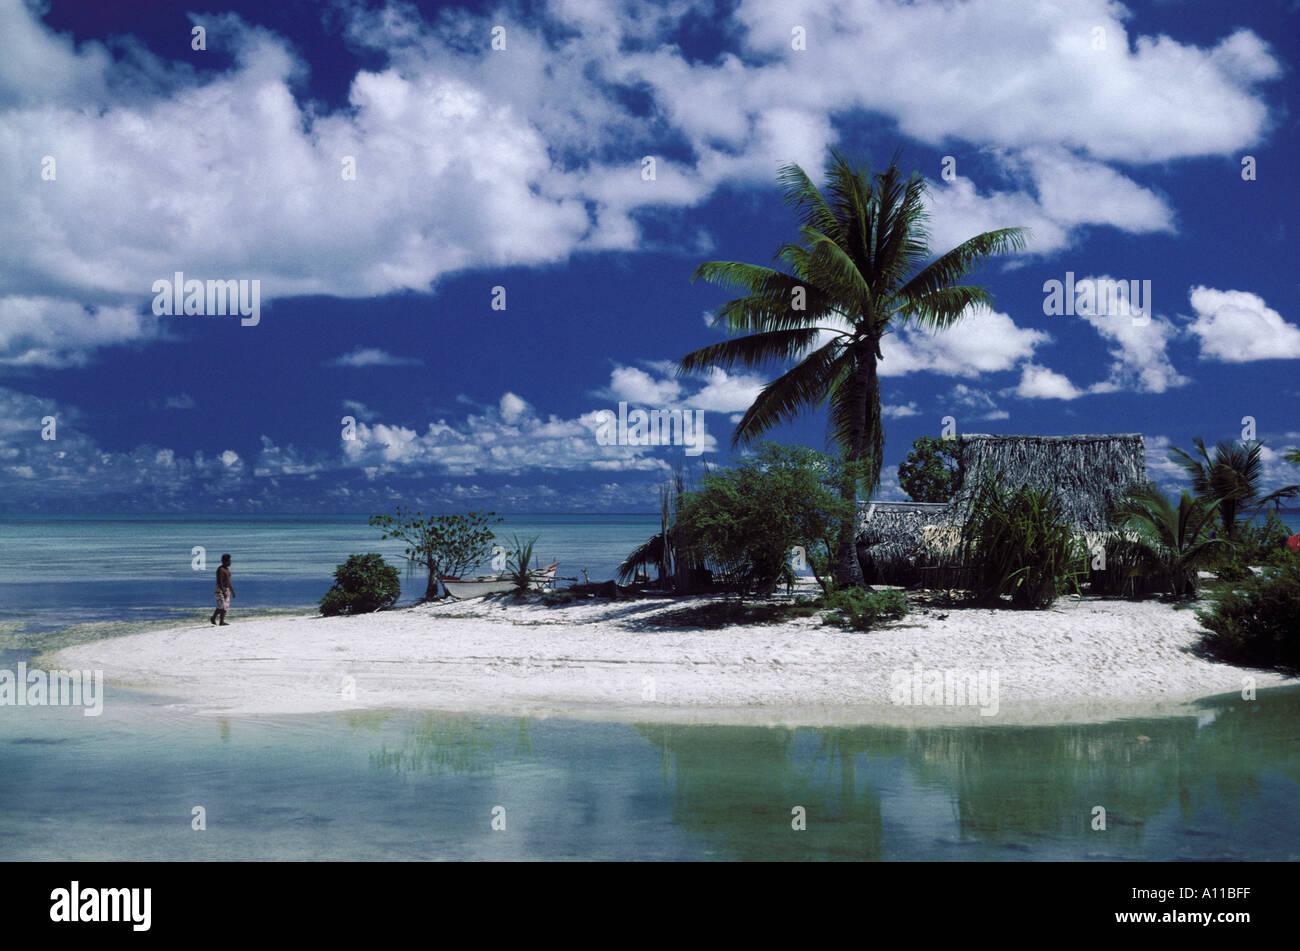 Islet on Tarawa atoll Kiribati Central Pacific - Stock Image